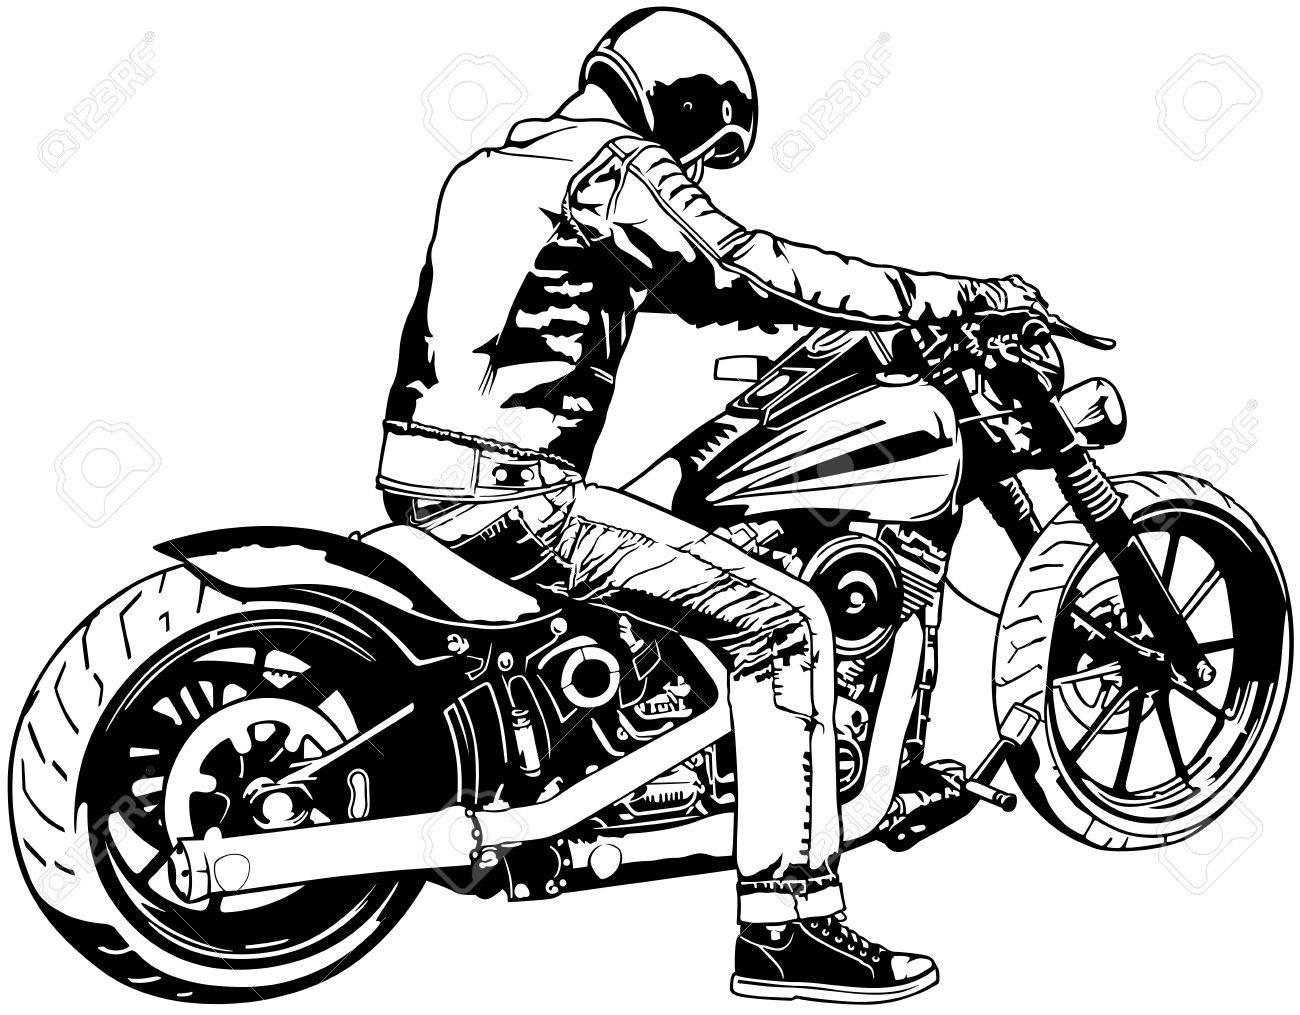 [Imagen: 83537691-moto-y-jinete-ilustraci%C3%B3n-...negro-.jpg]